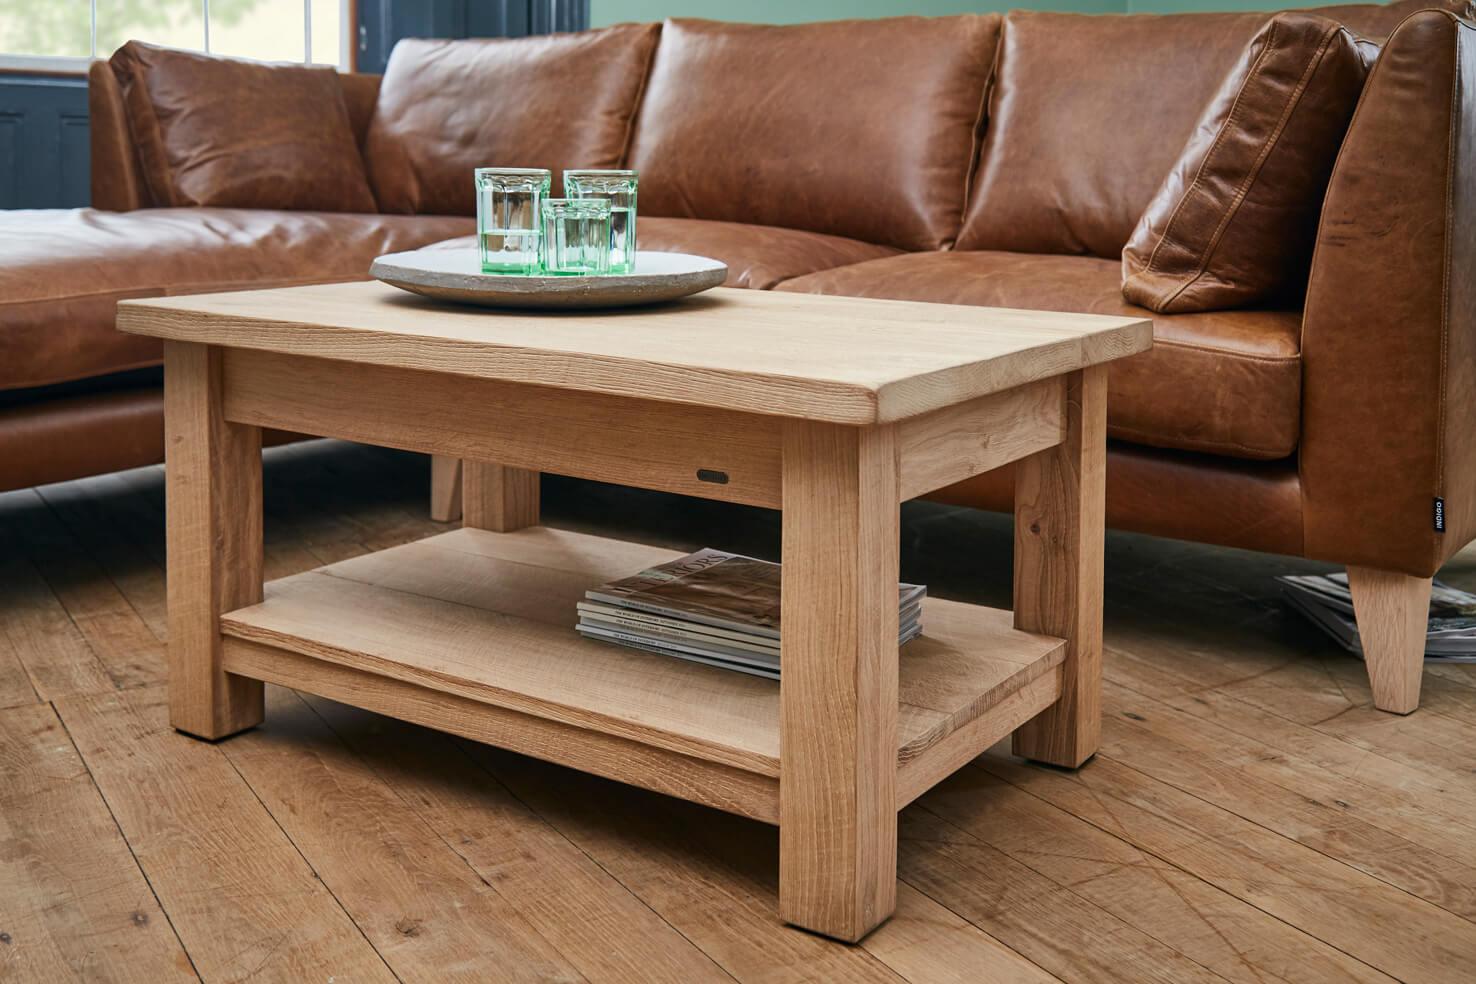 Oak Coffee Table Indigo Furniture with regard to dimensions 1476 X 984